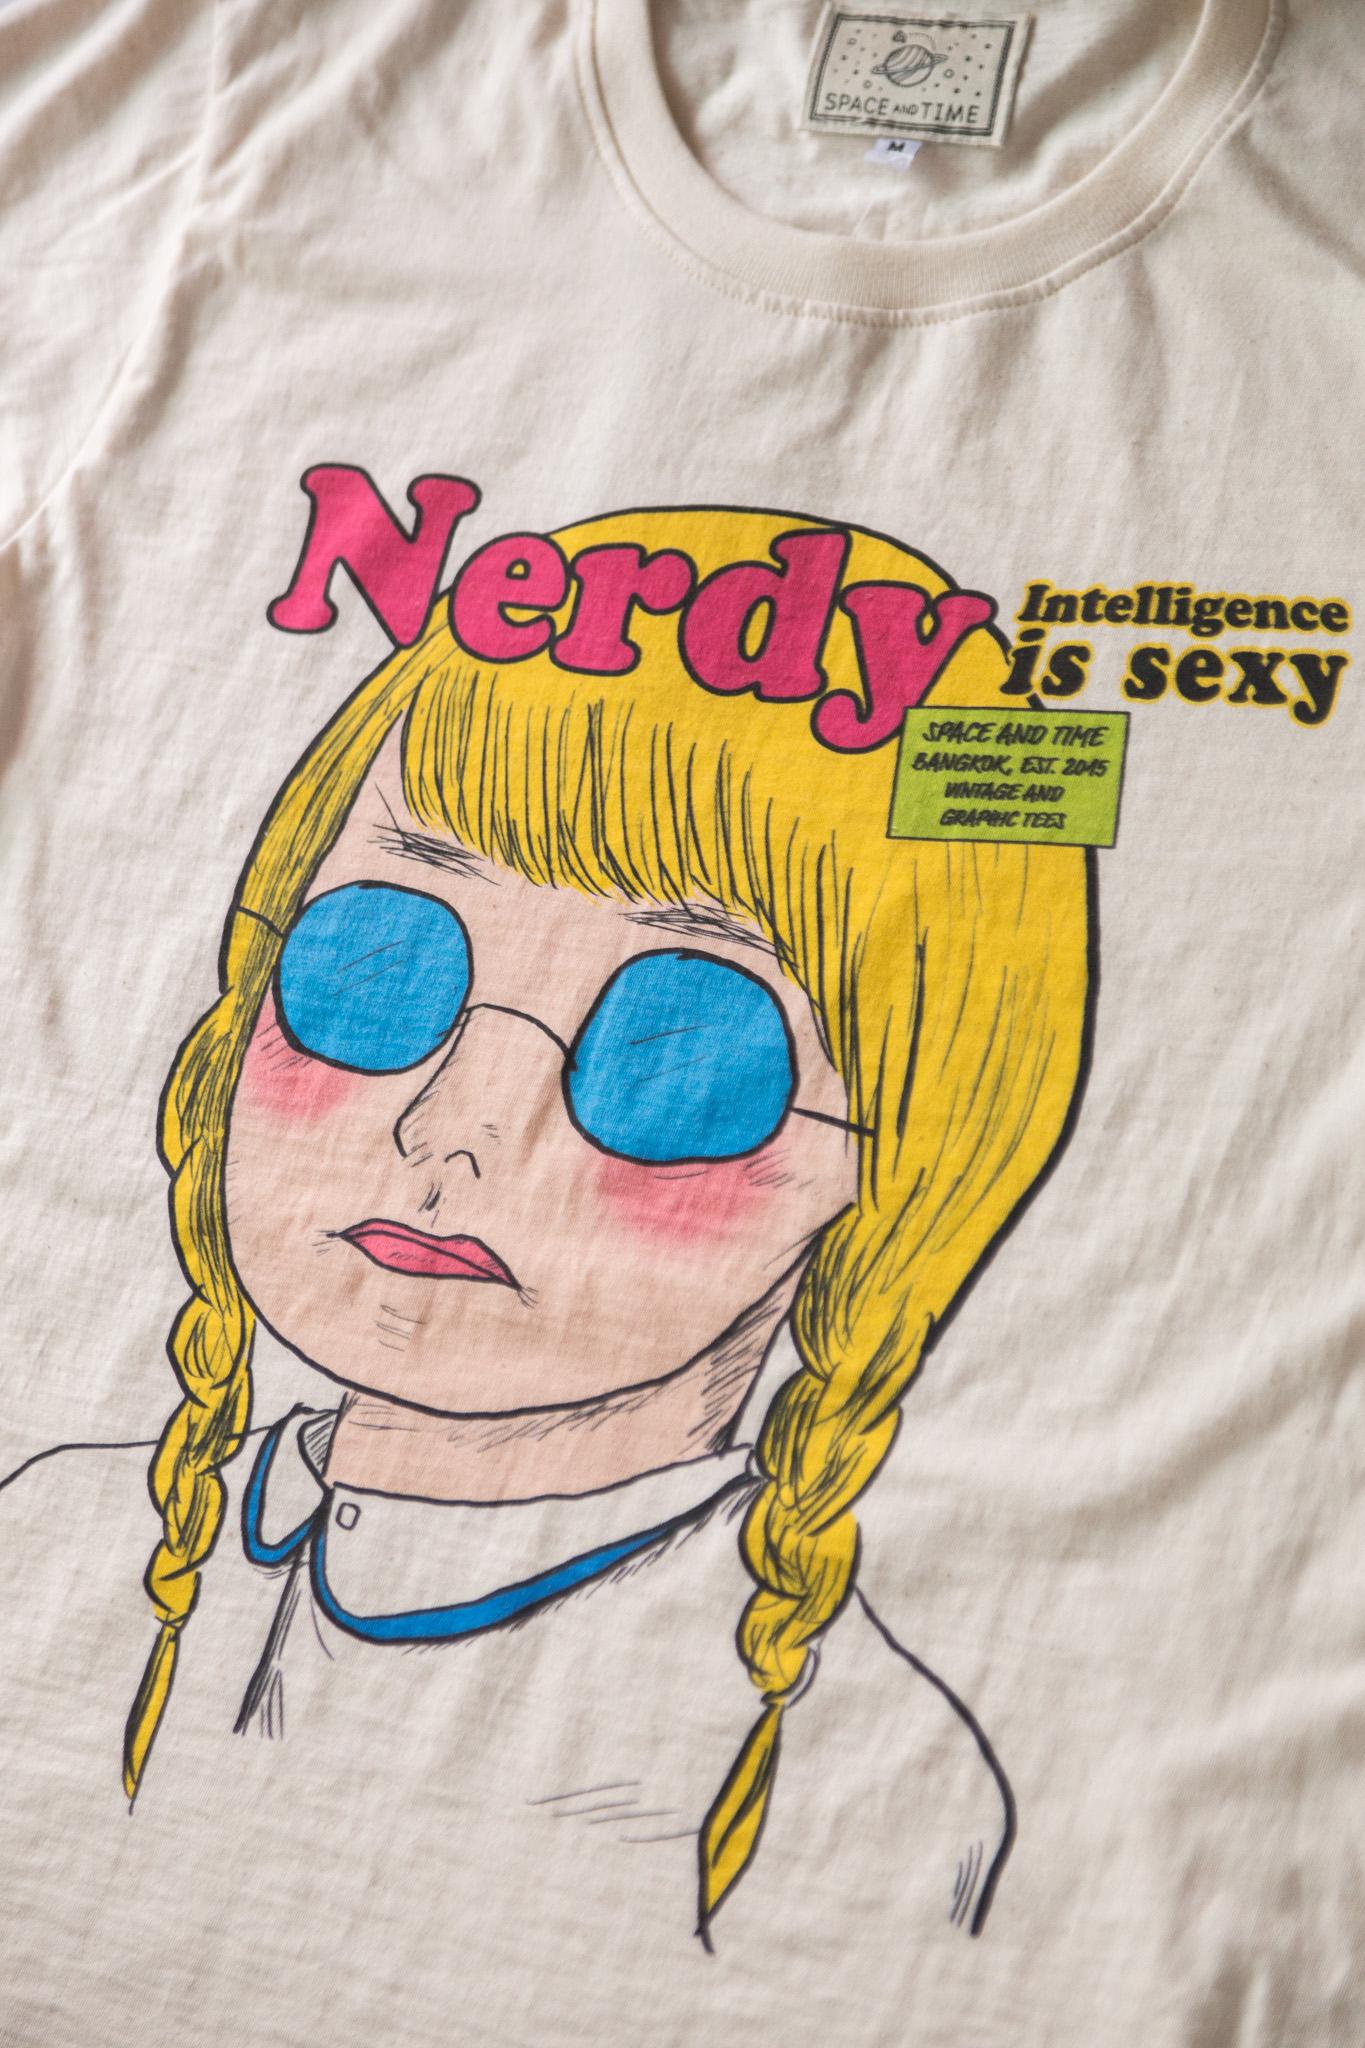 tee,tshirt,Teeshirt,เสื้อ,เสื้อยืด,unisex,vintage,วินเทจ,retro